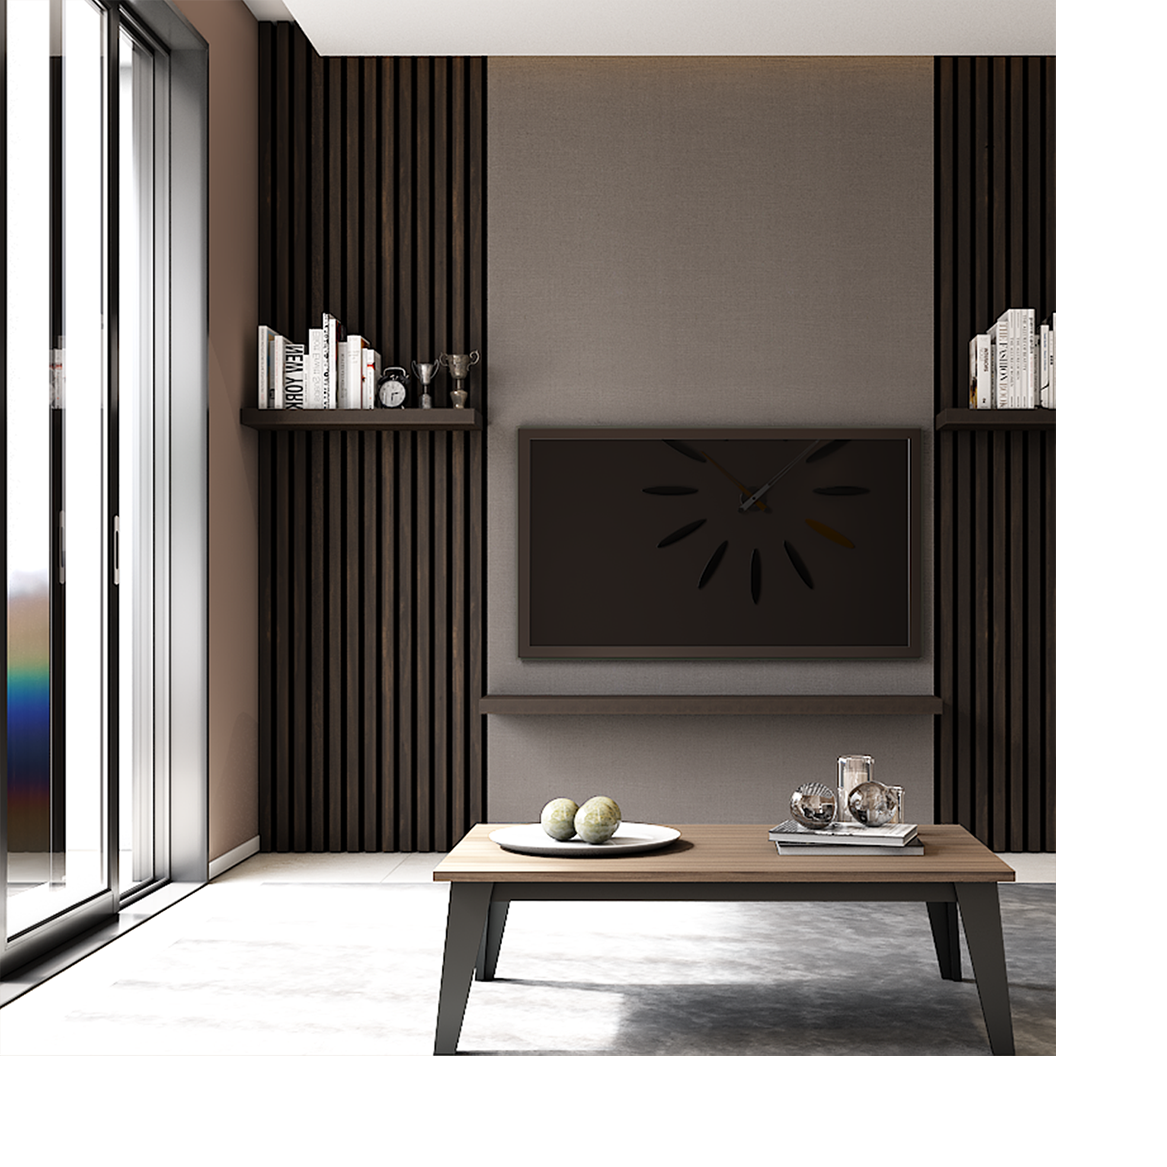 ESTELLA HEIGHTS 2 BEDROOMS - MODERN -